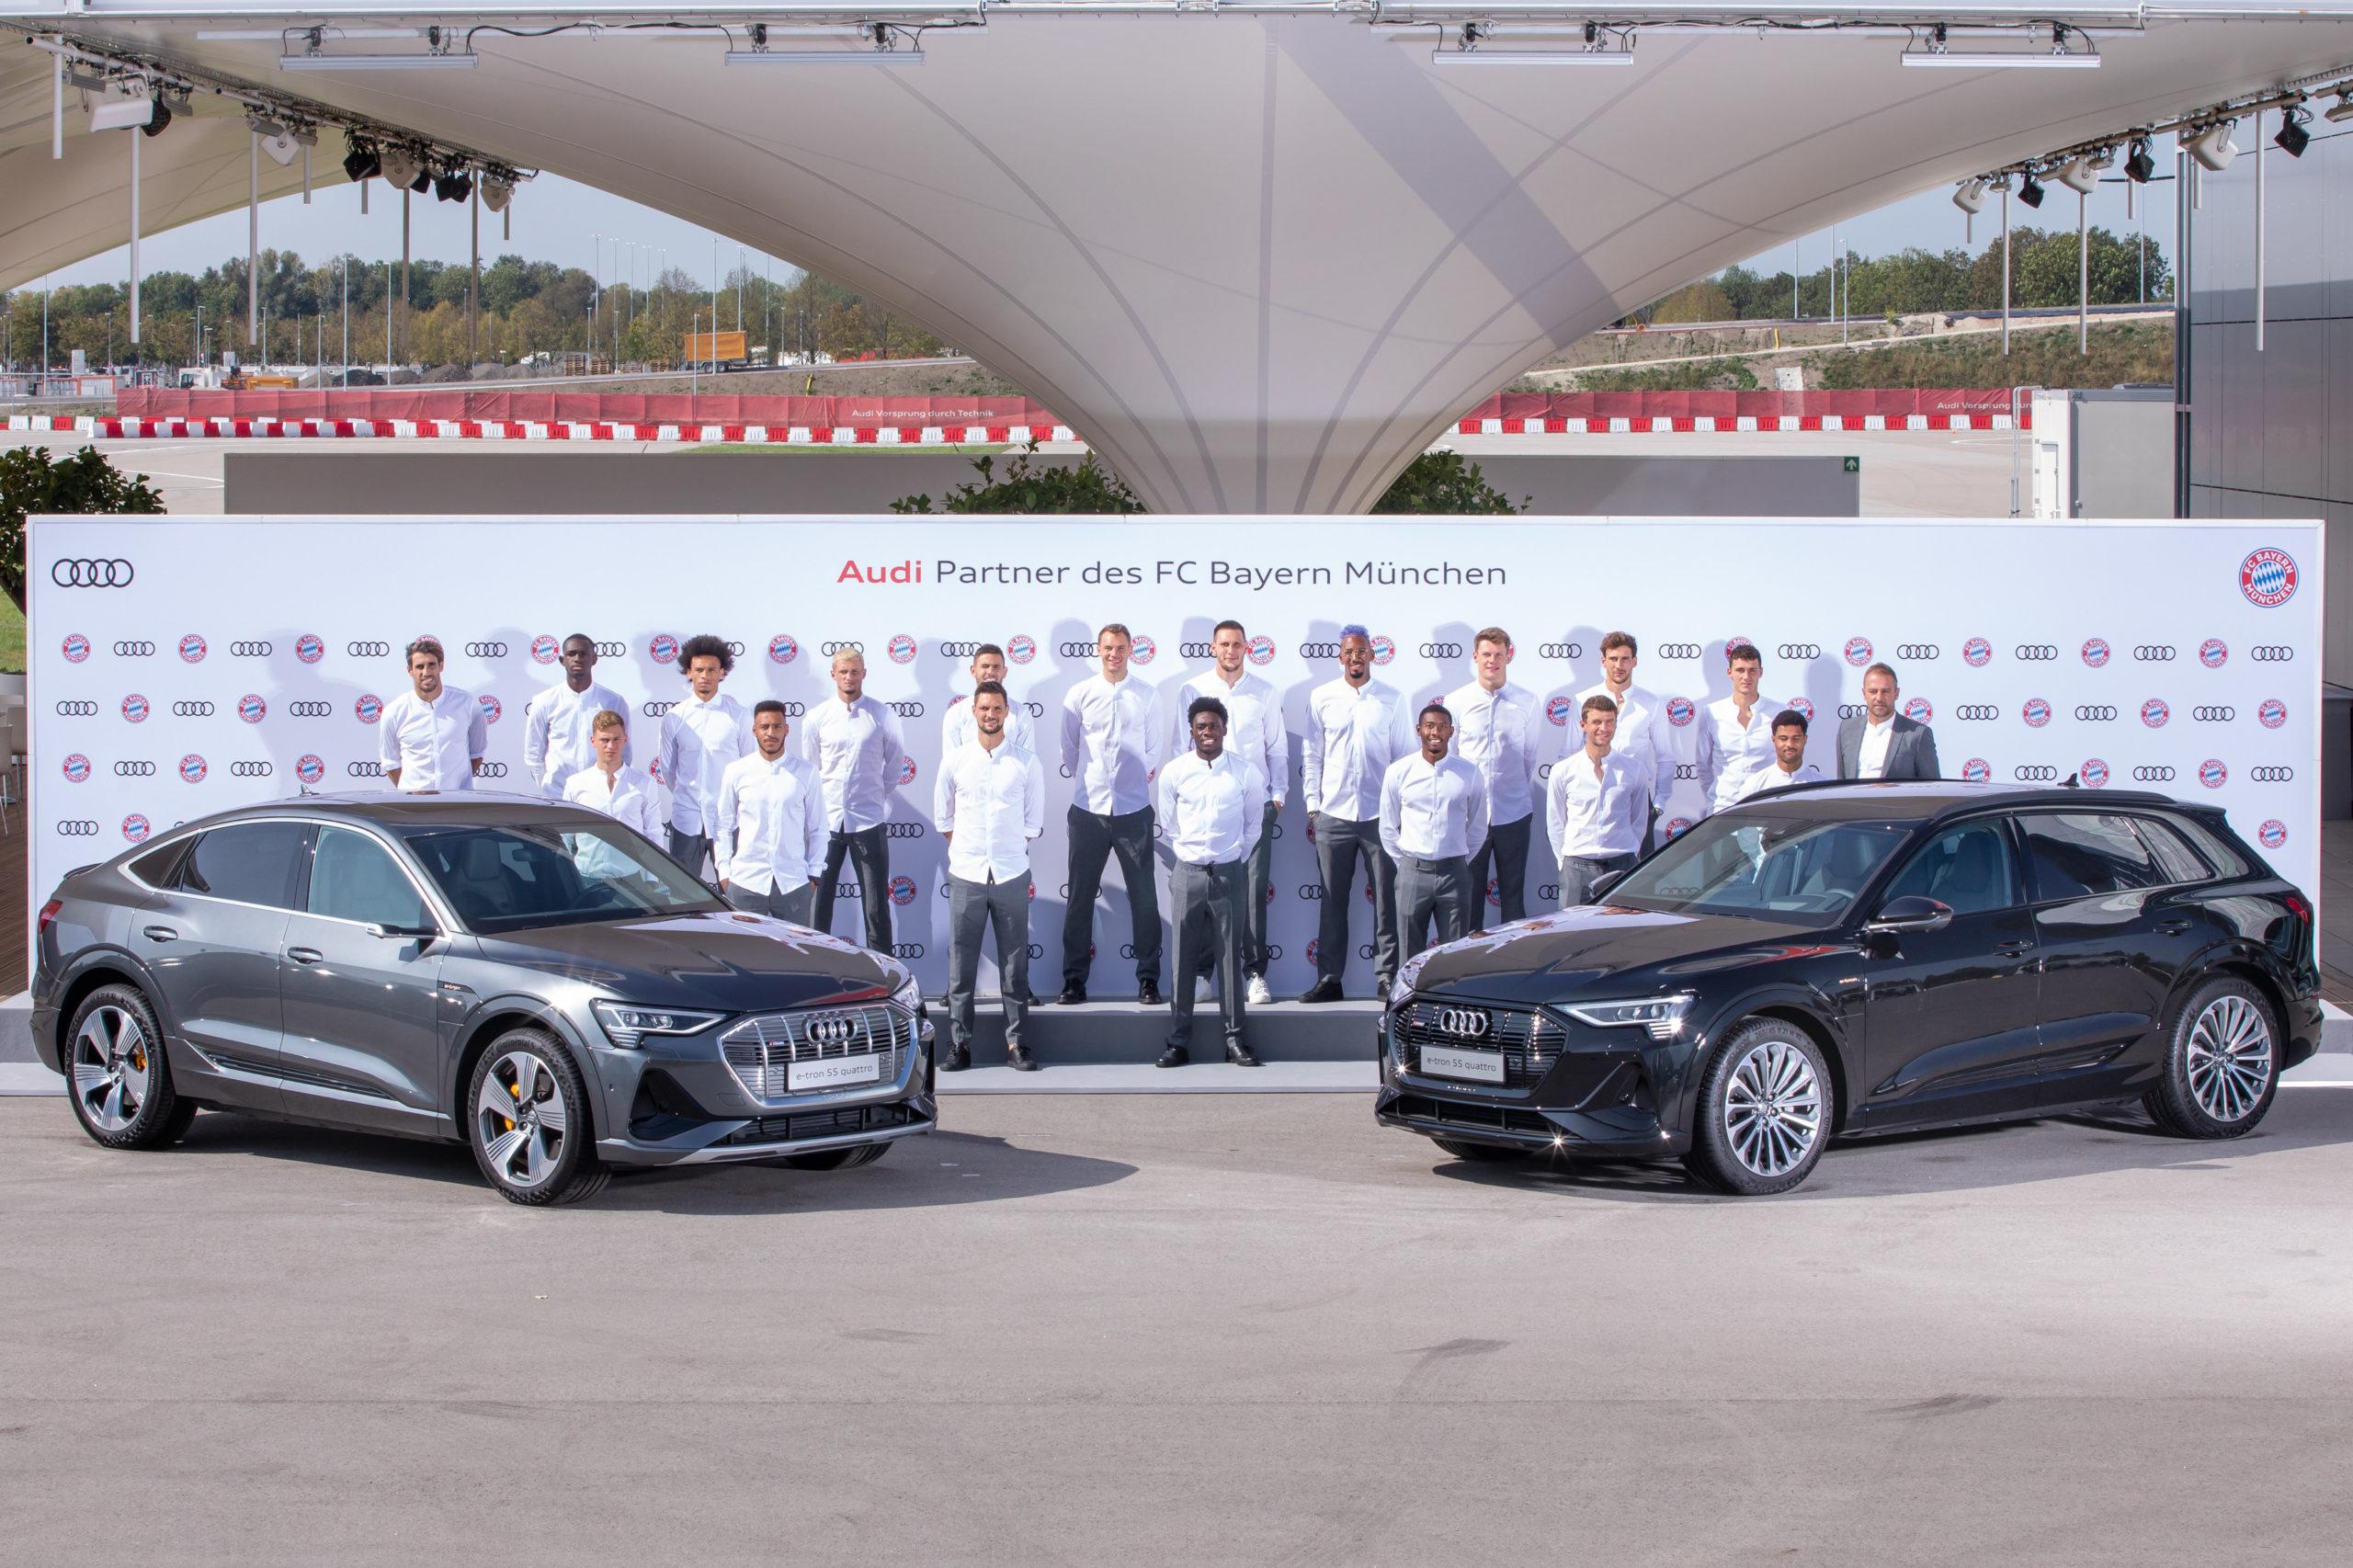 Audi electrifies FC Bayern Munich (Photos)